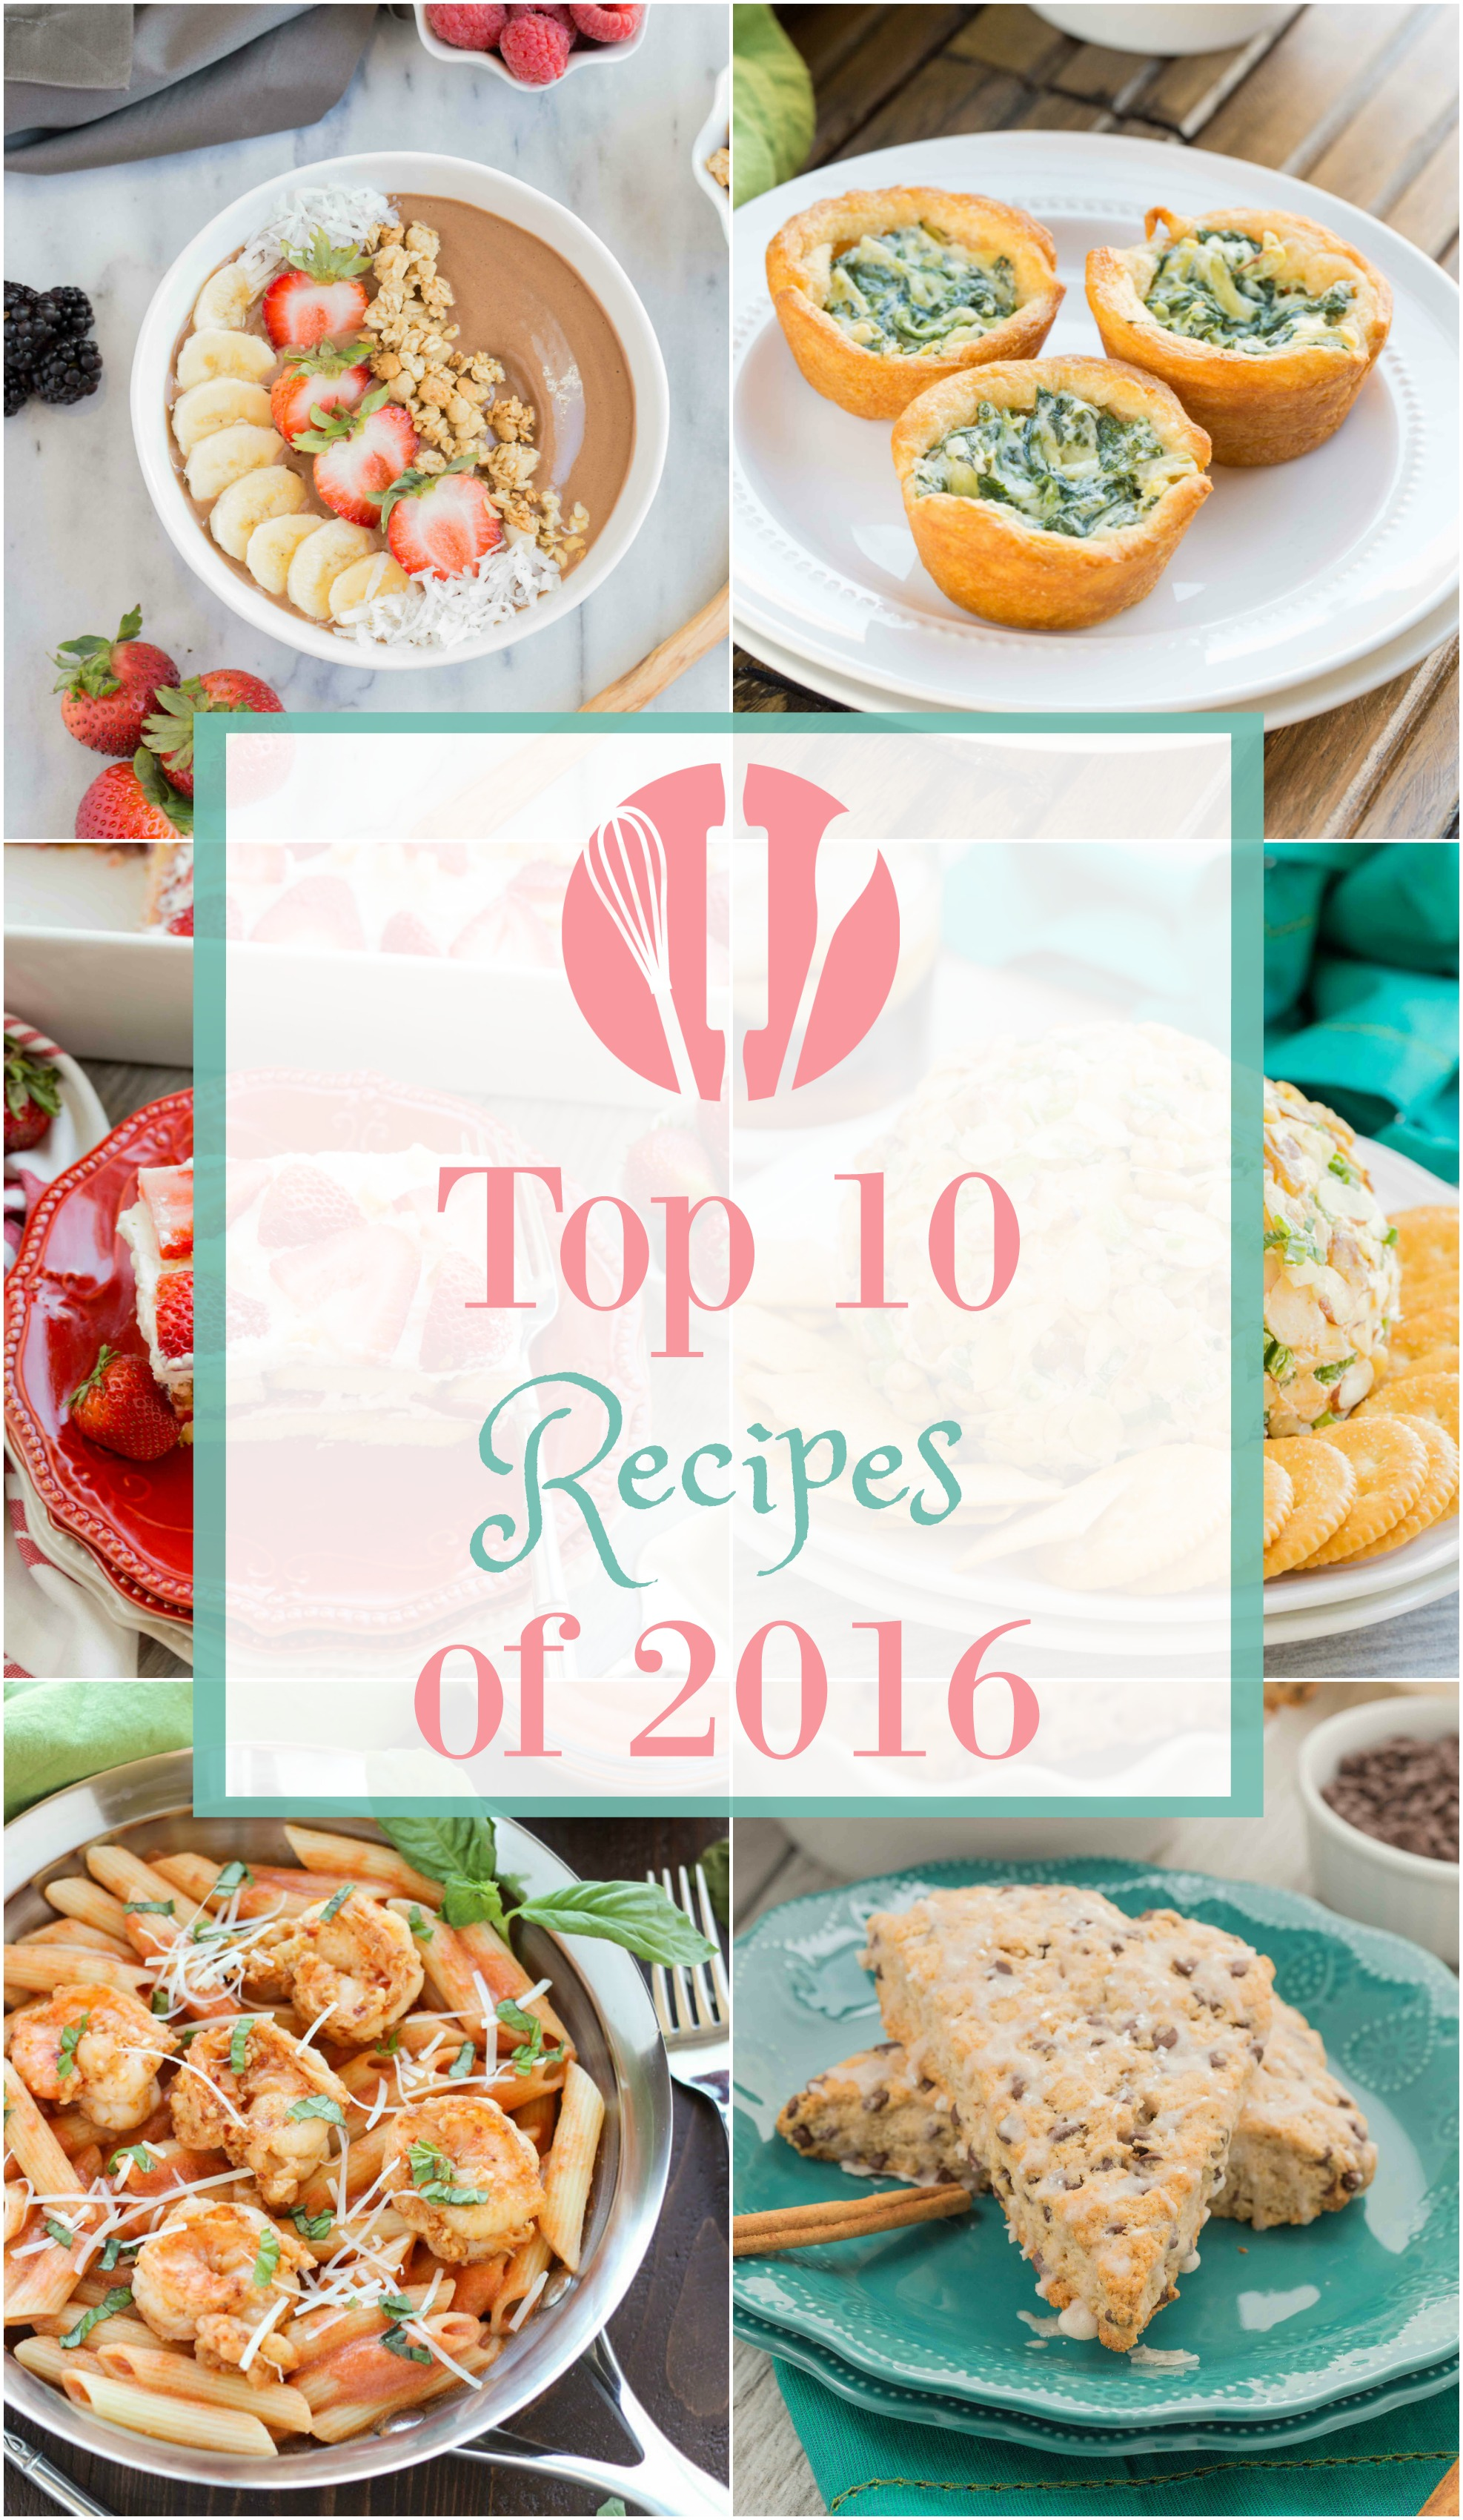 Top 10 Recipes of 2016 - My Kitchen Craze